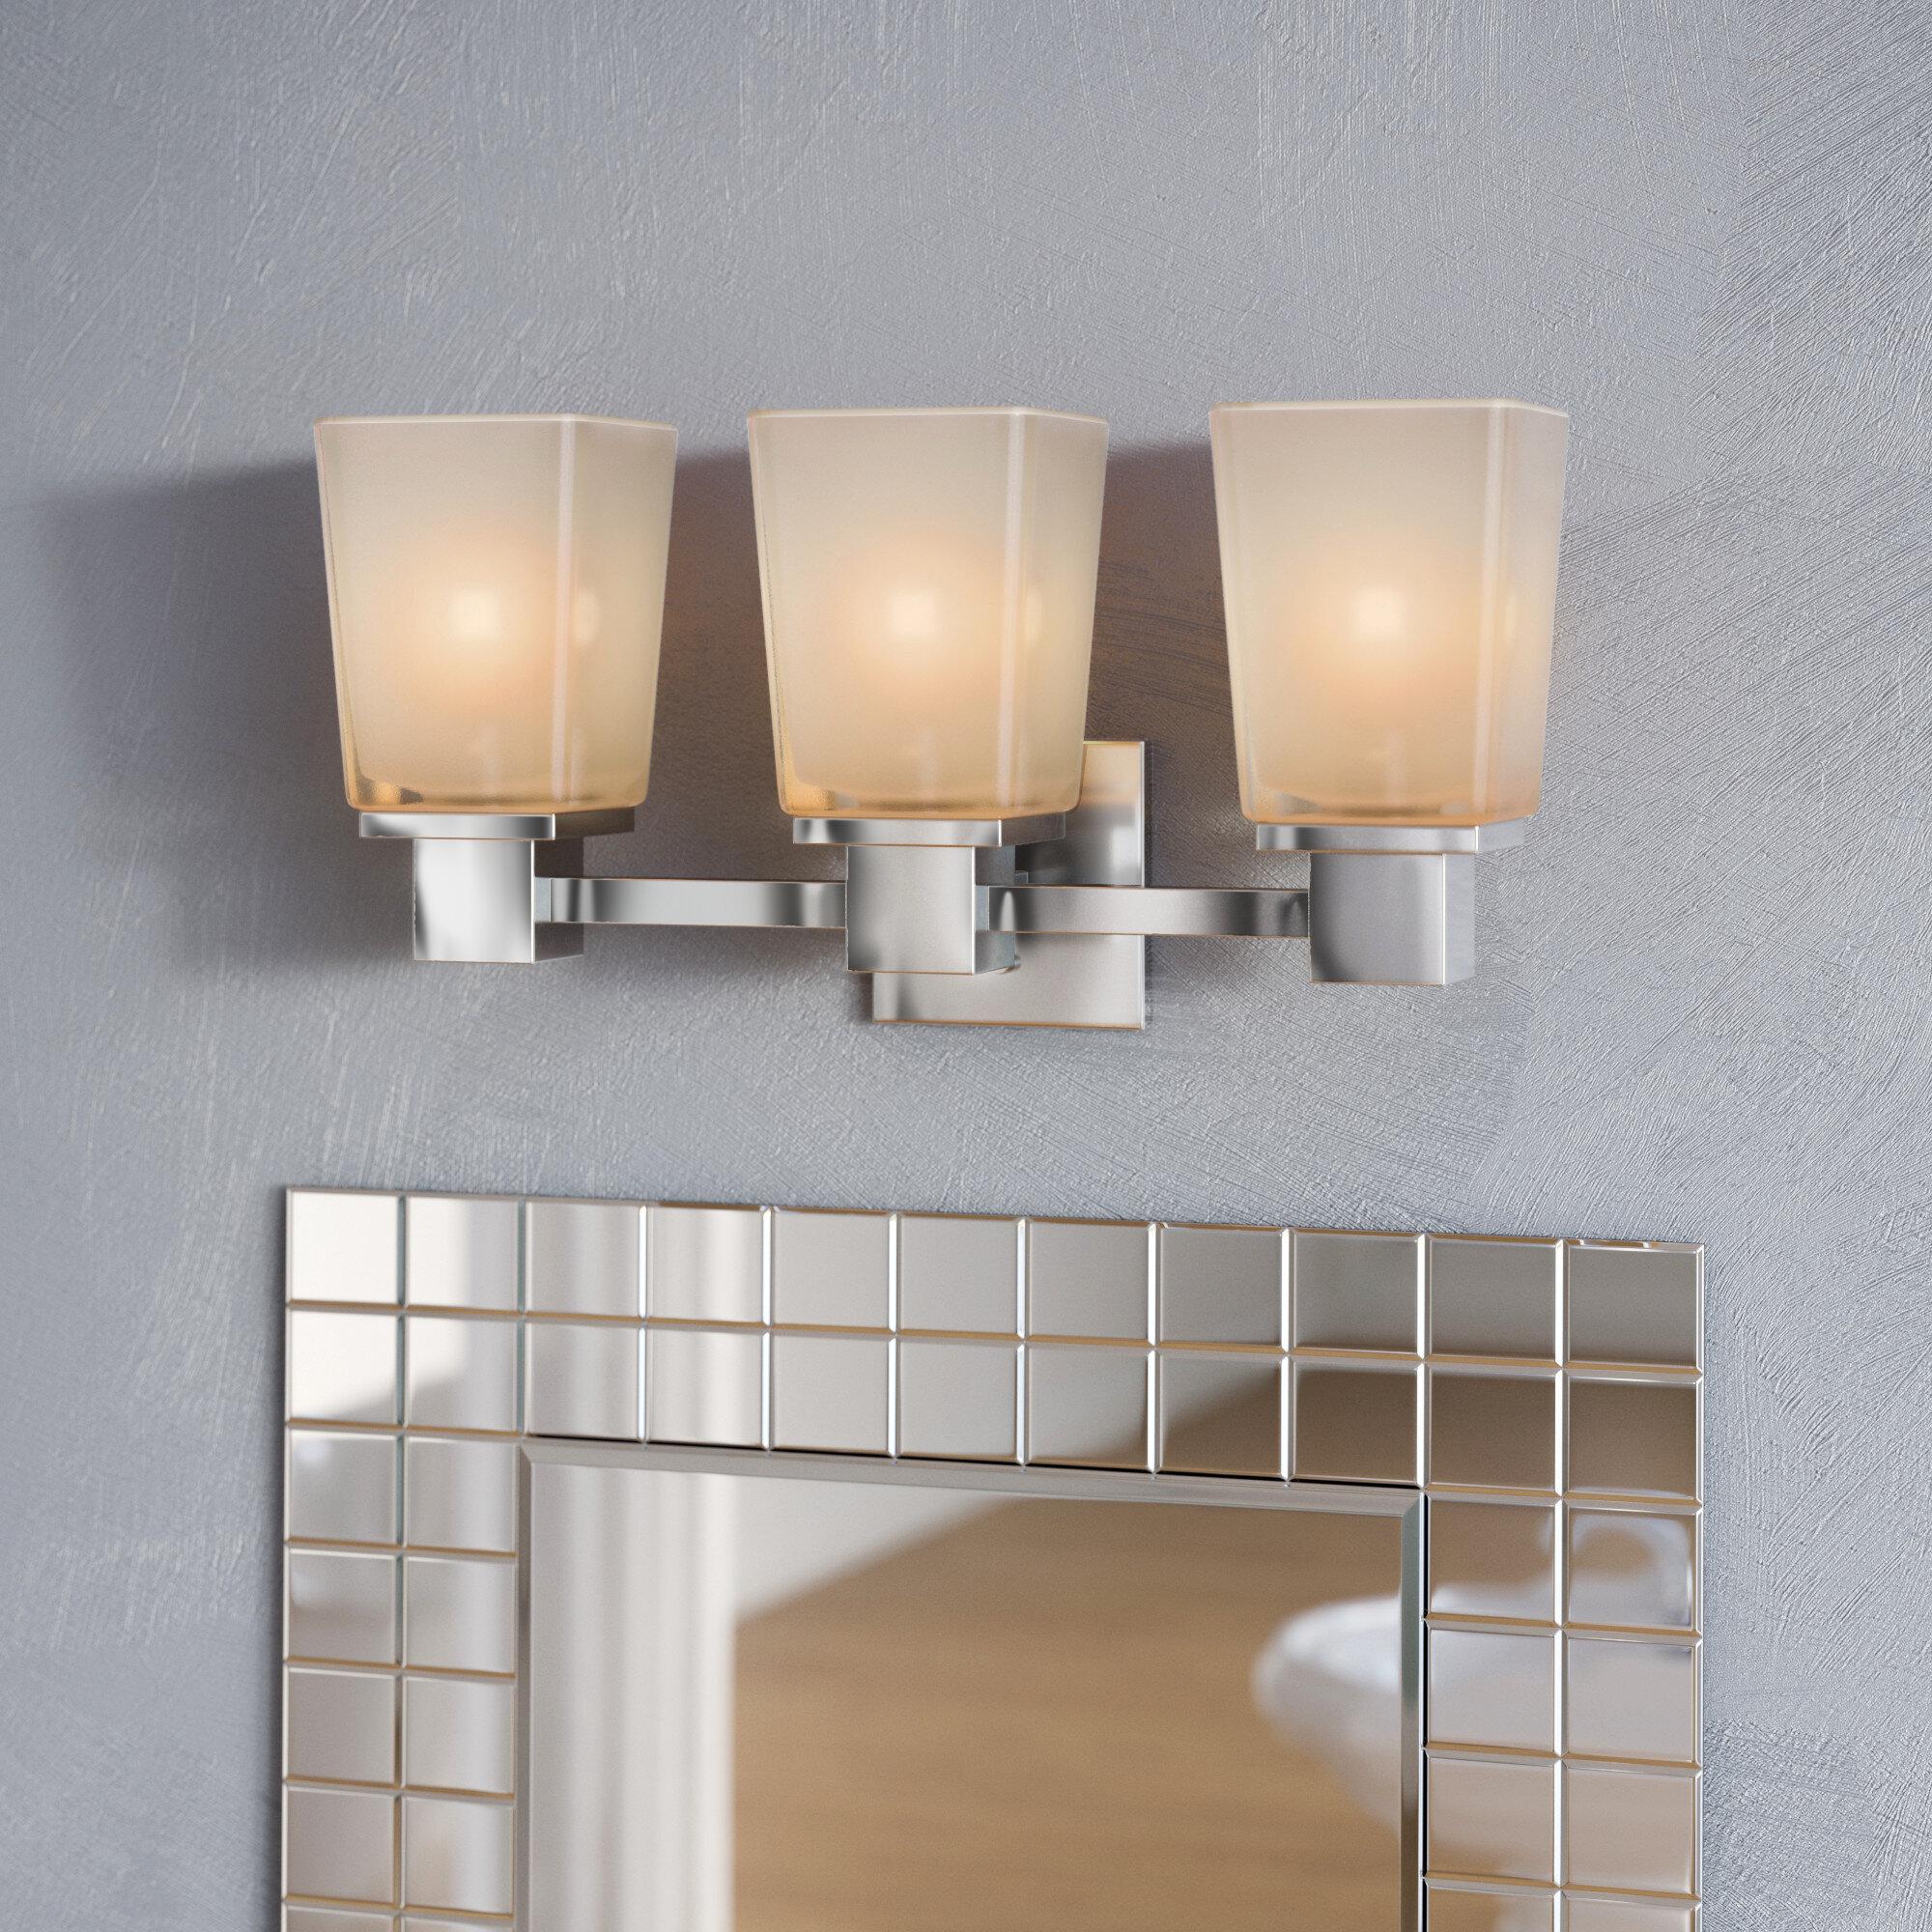 Ebern designs edington 3 light vanity light reviews wayfair